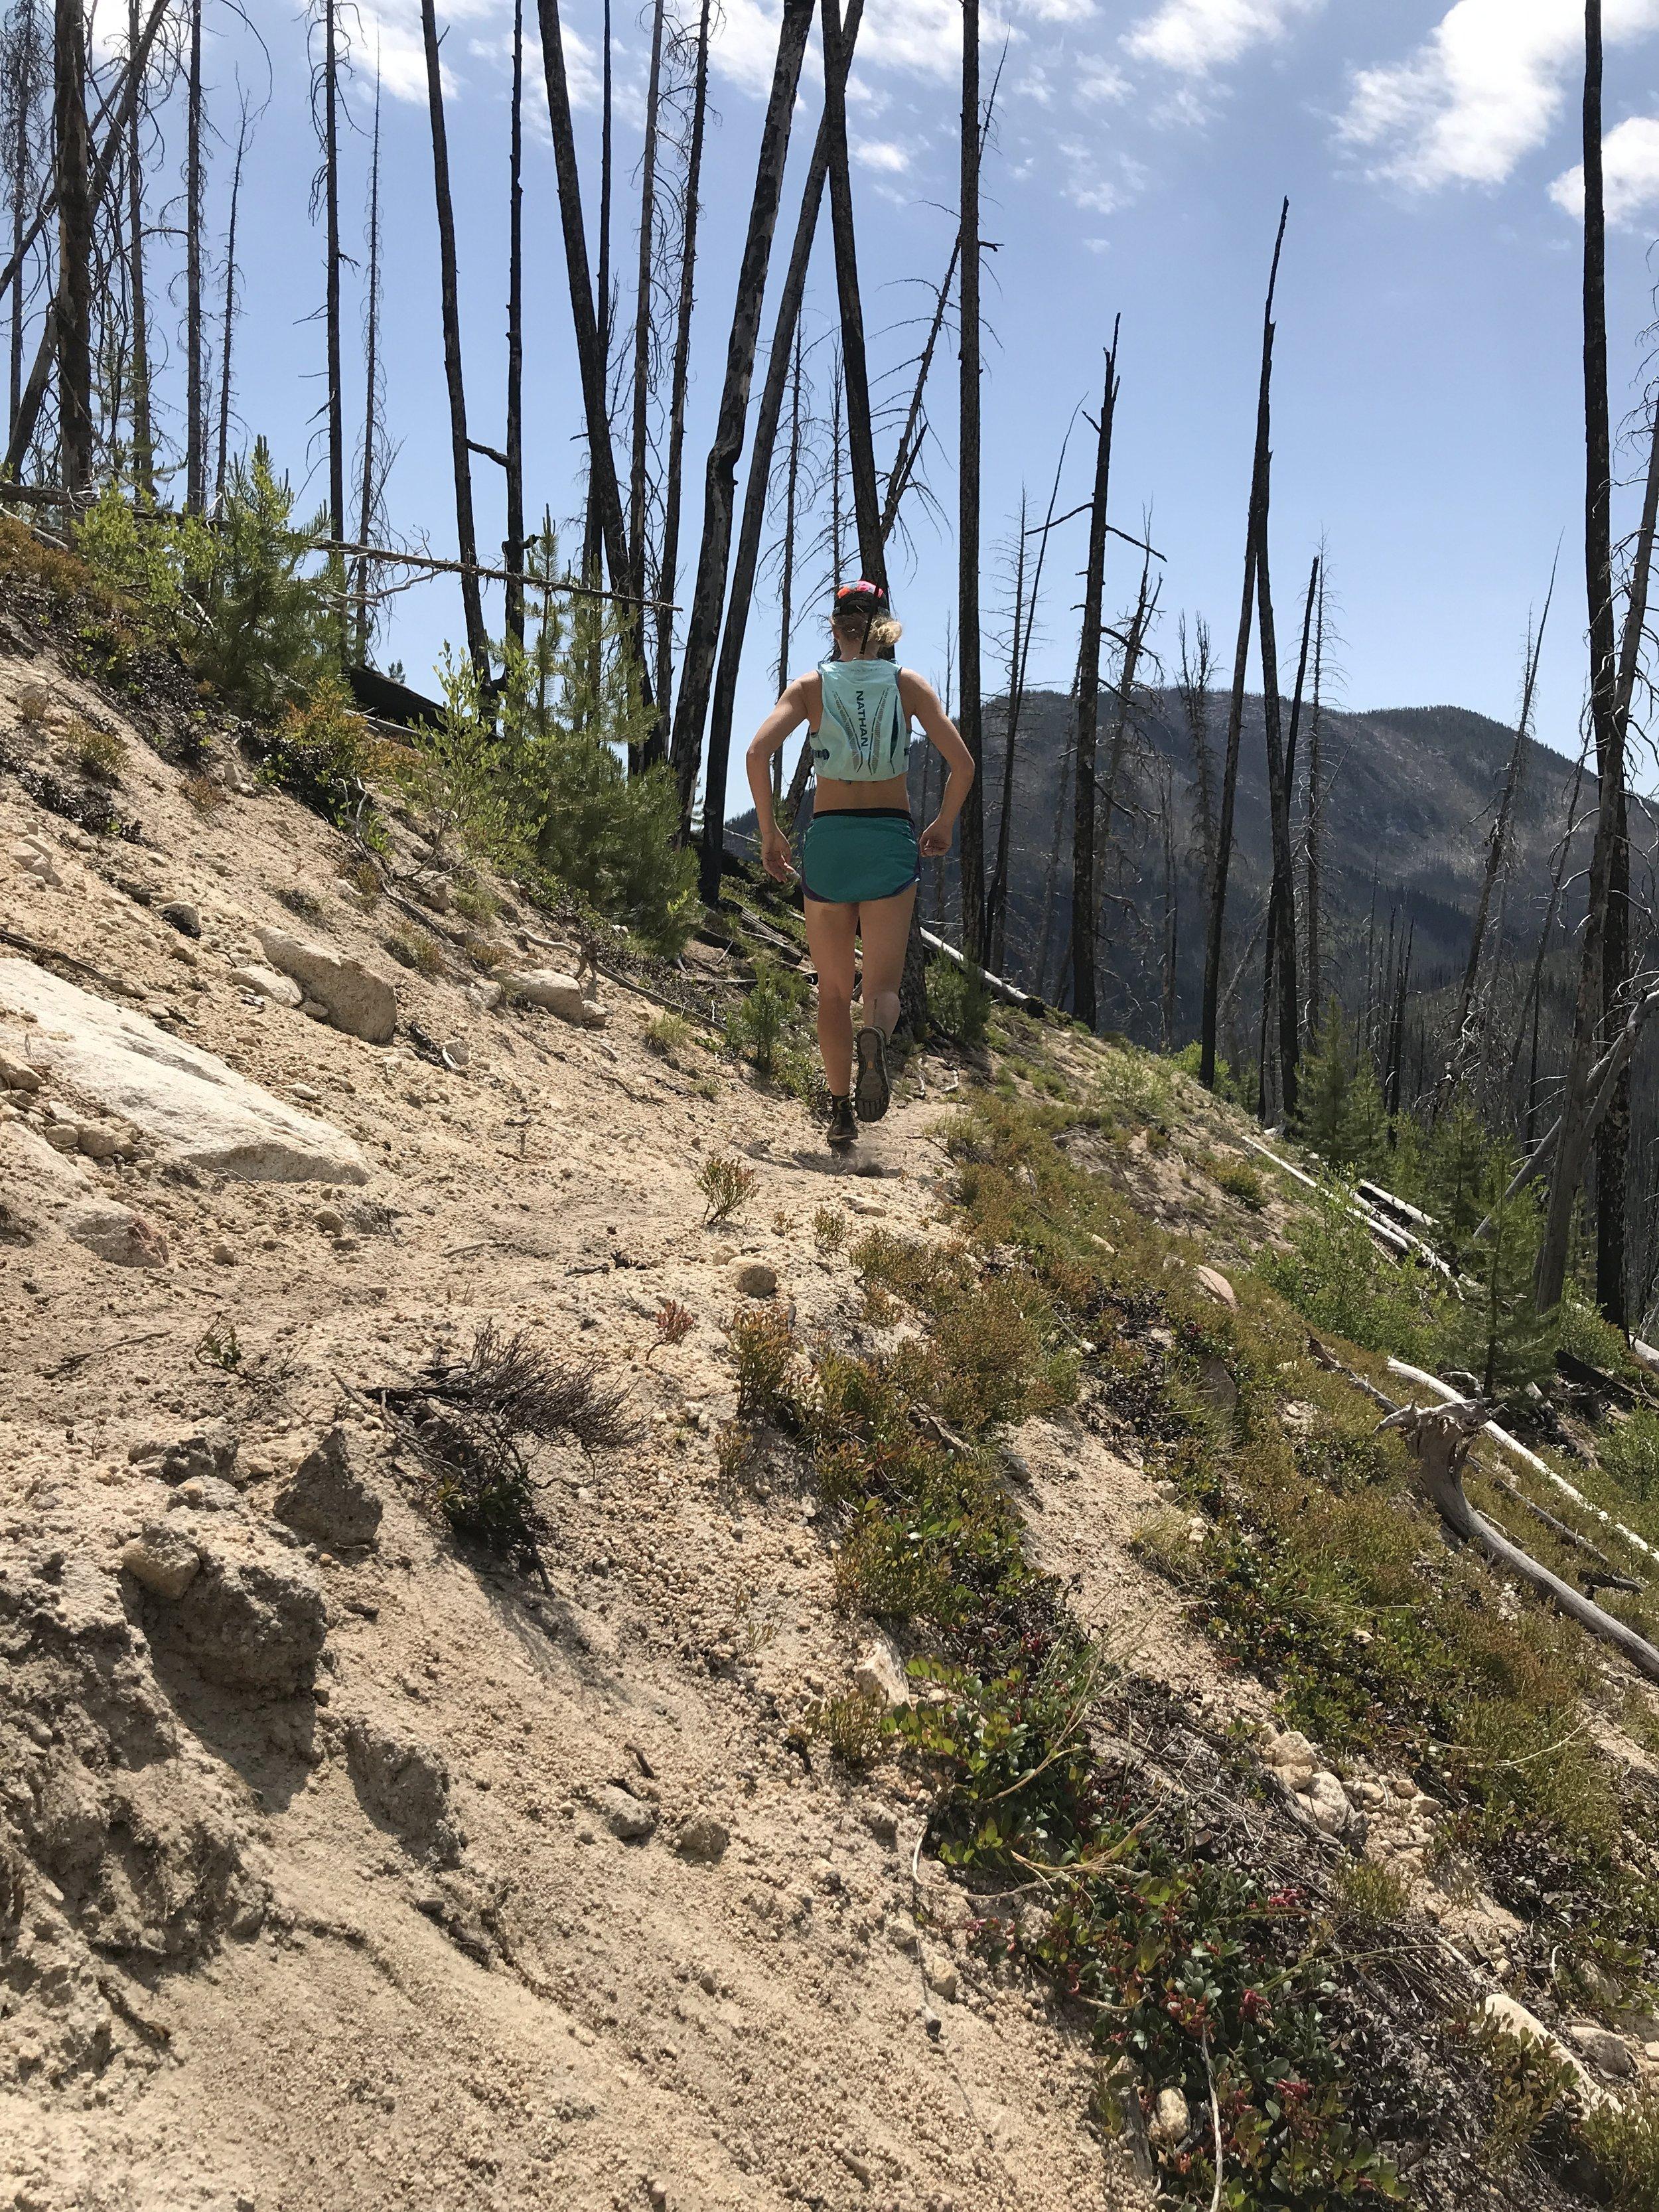 running to a distant alpine lake with a sleek Tenkara USA rod, summer 2018, self-portrait